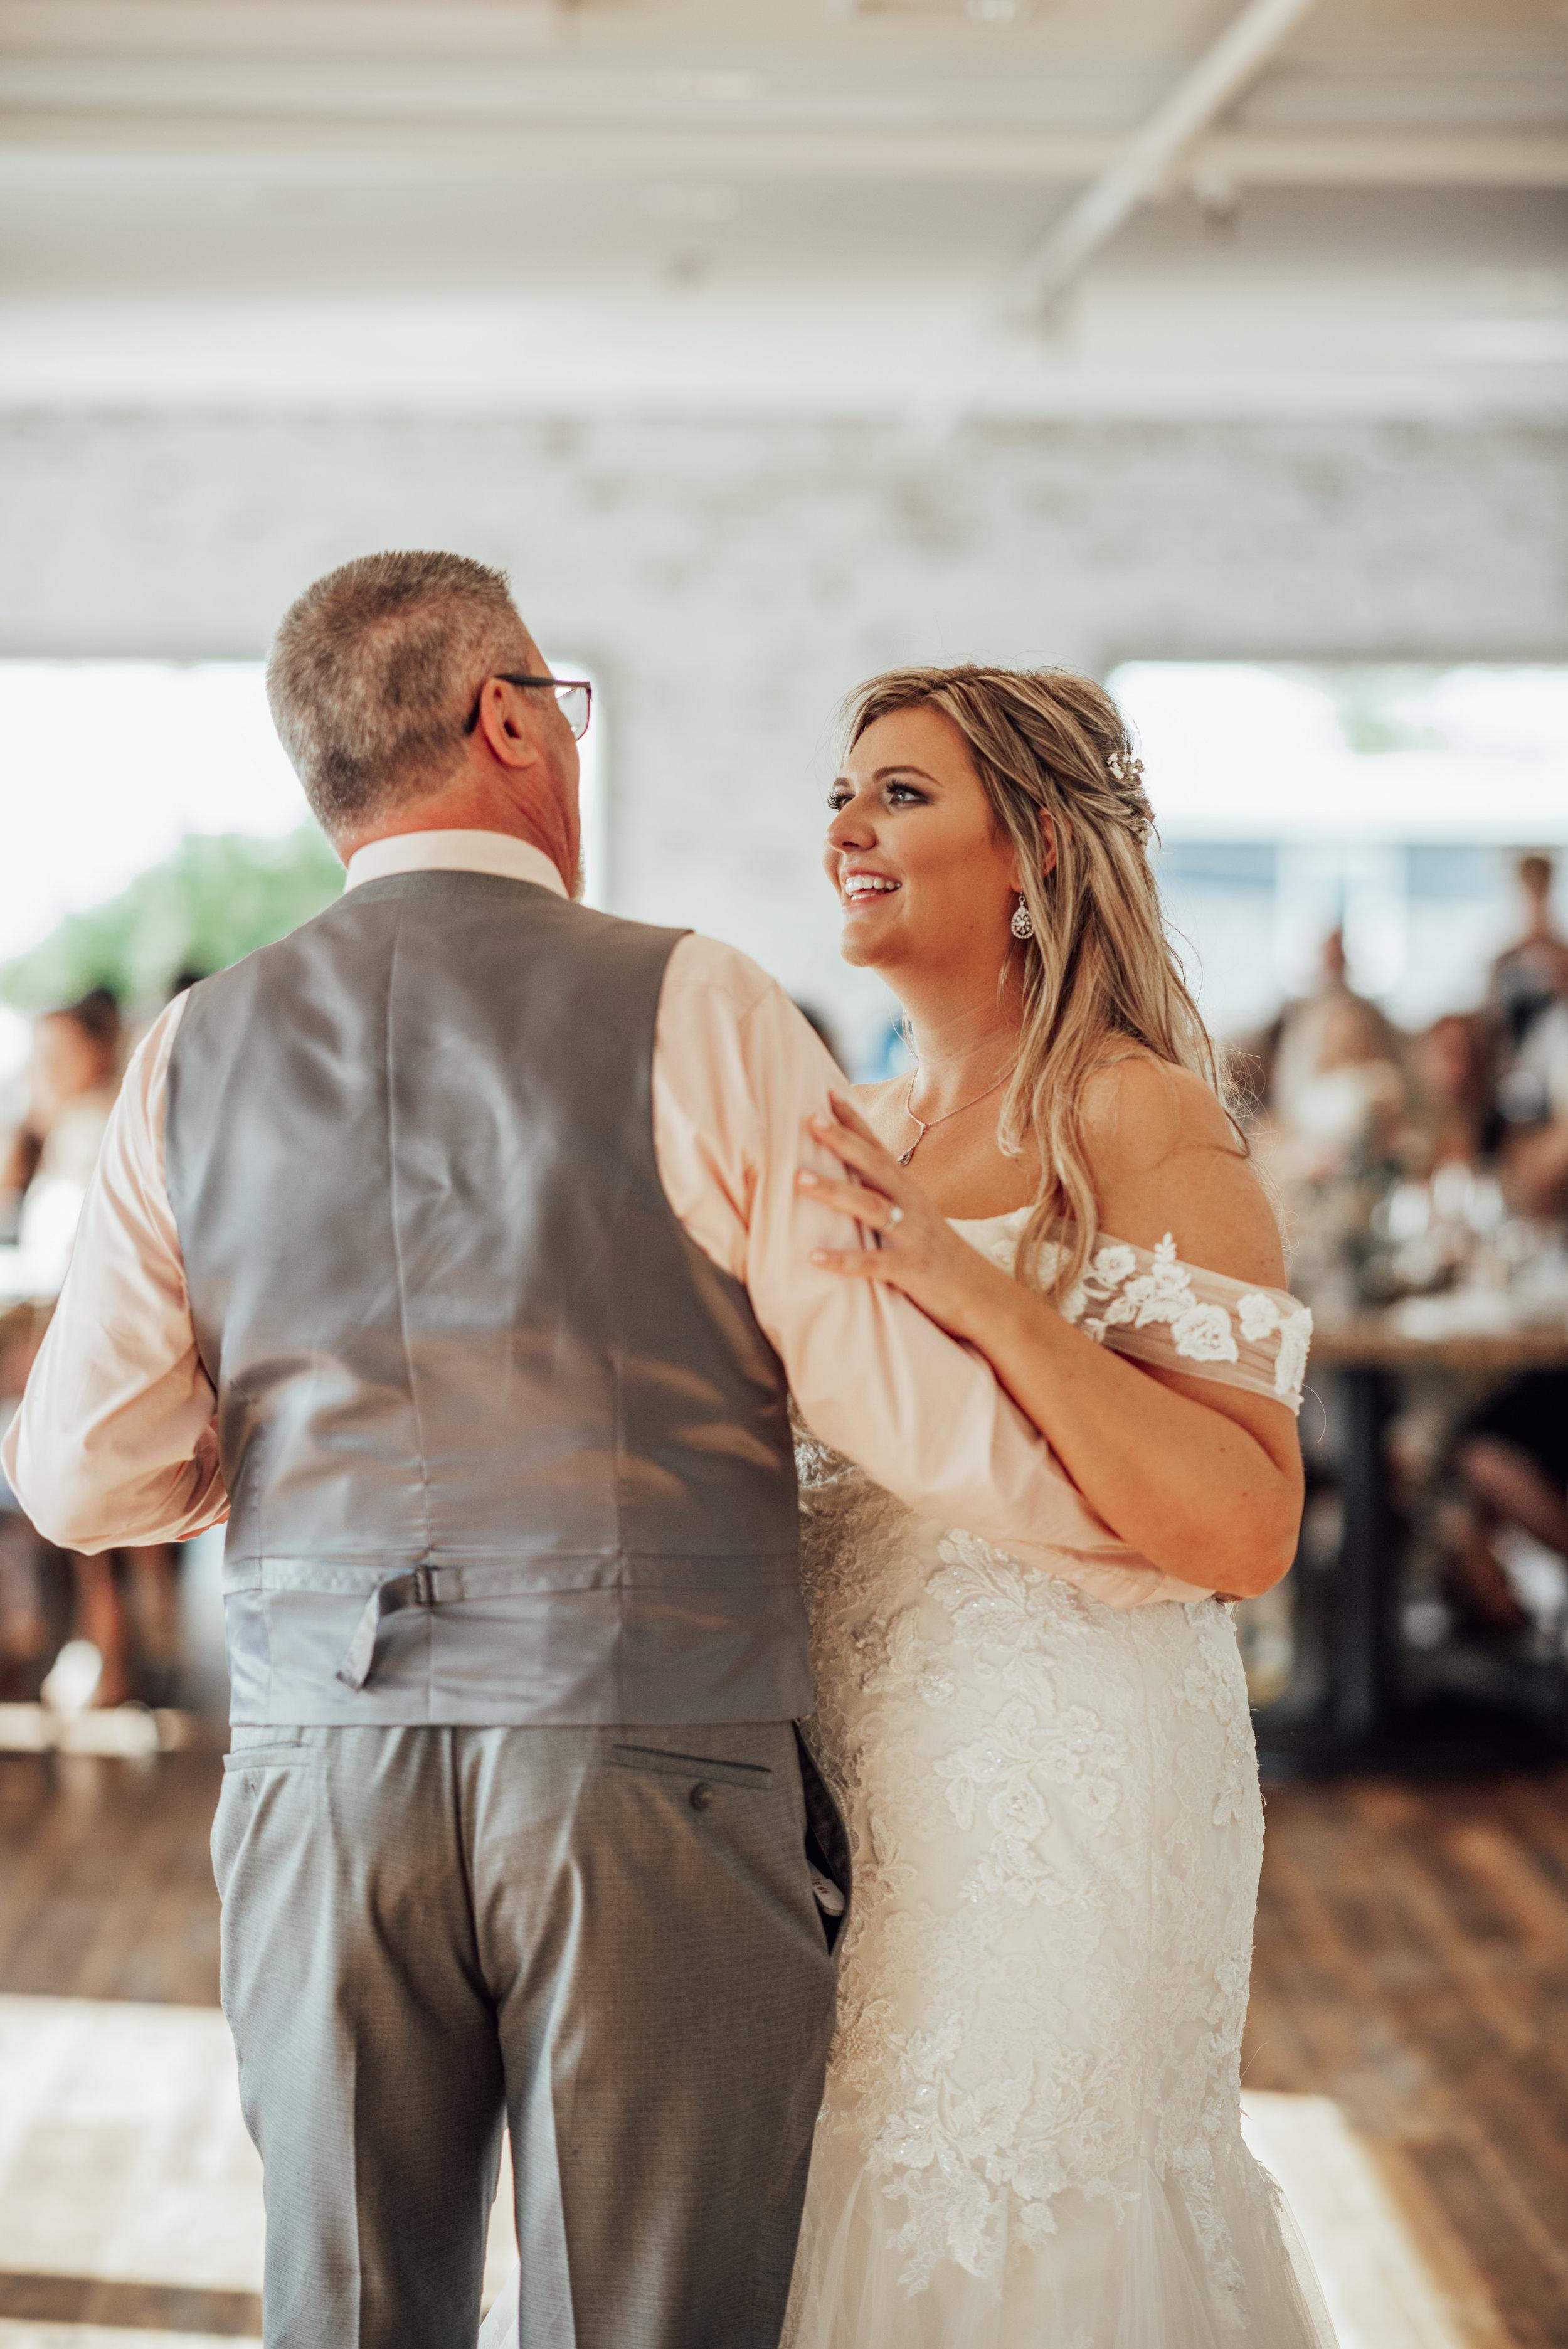 New Jersey Wedding Photographer, Felsberg Photography LBI wedding photography 97.jpg